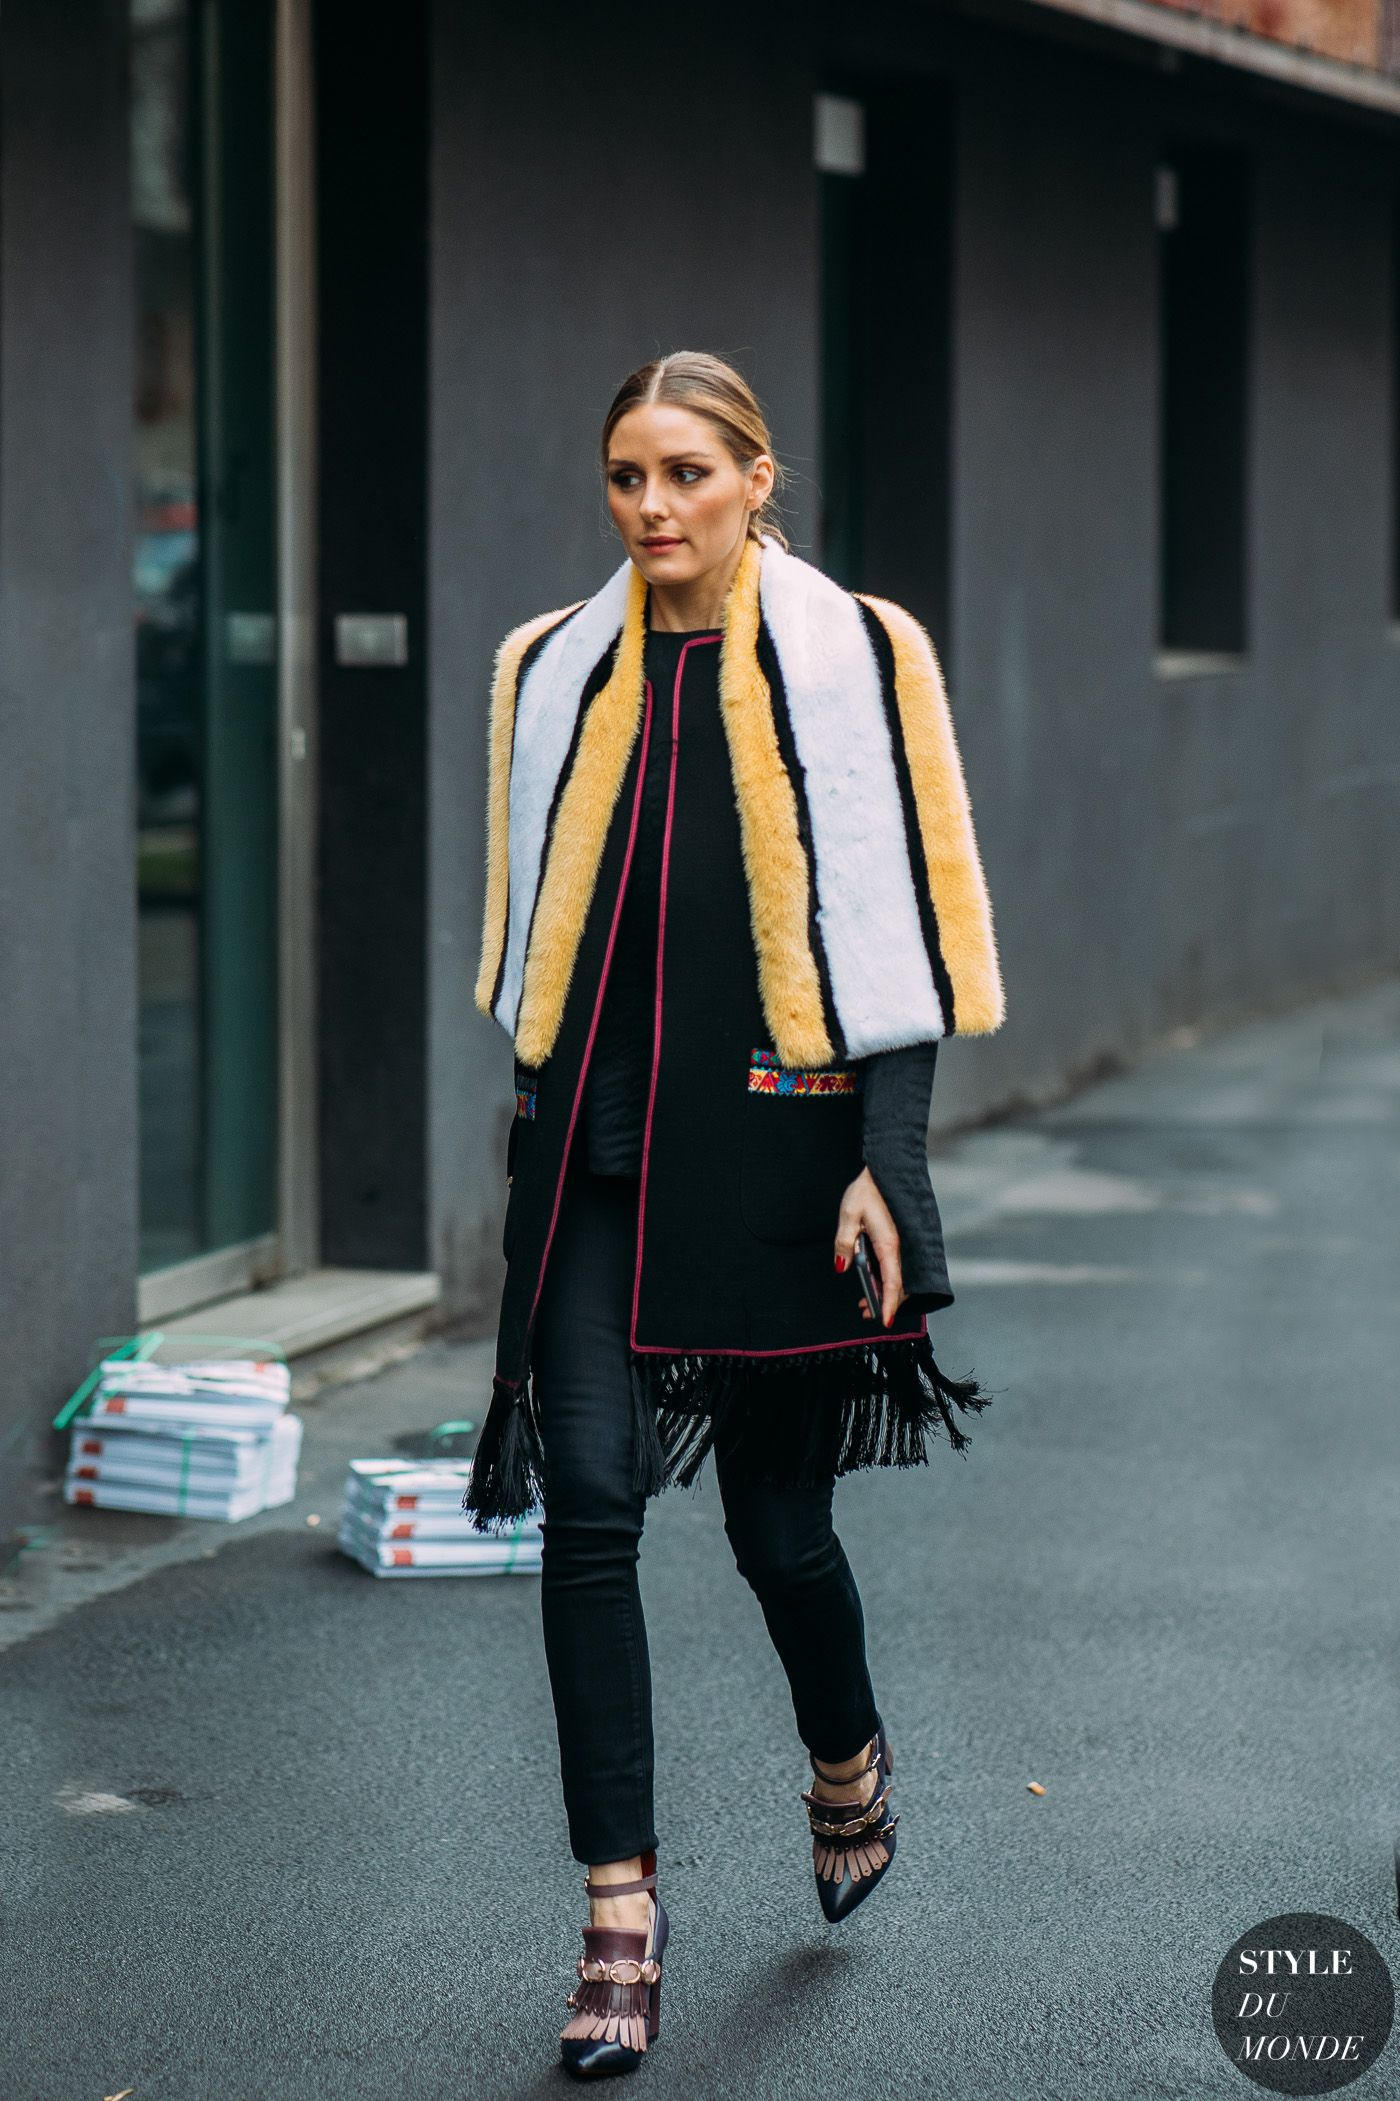 Milan FW 2018 Street Style  Olivia Palermo StyleDuMonde 2f684b5196328